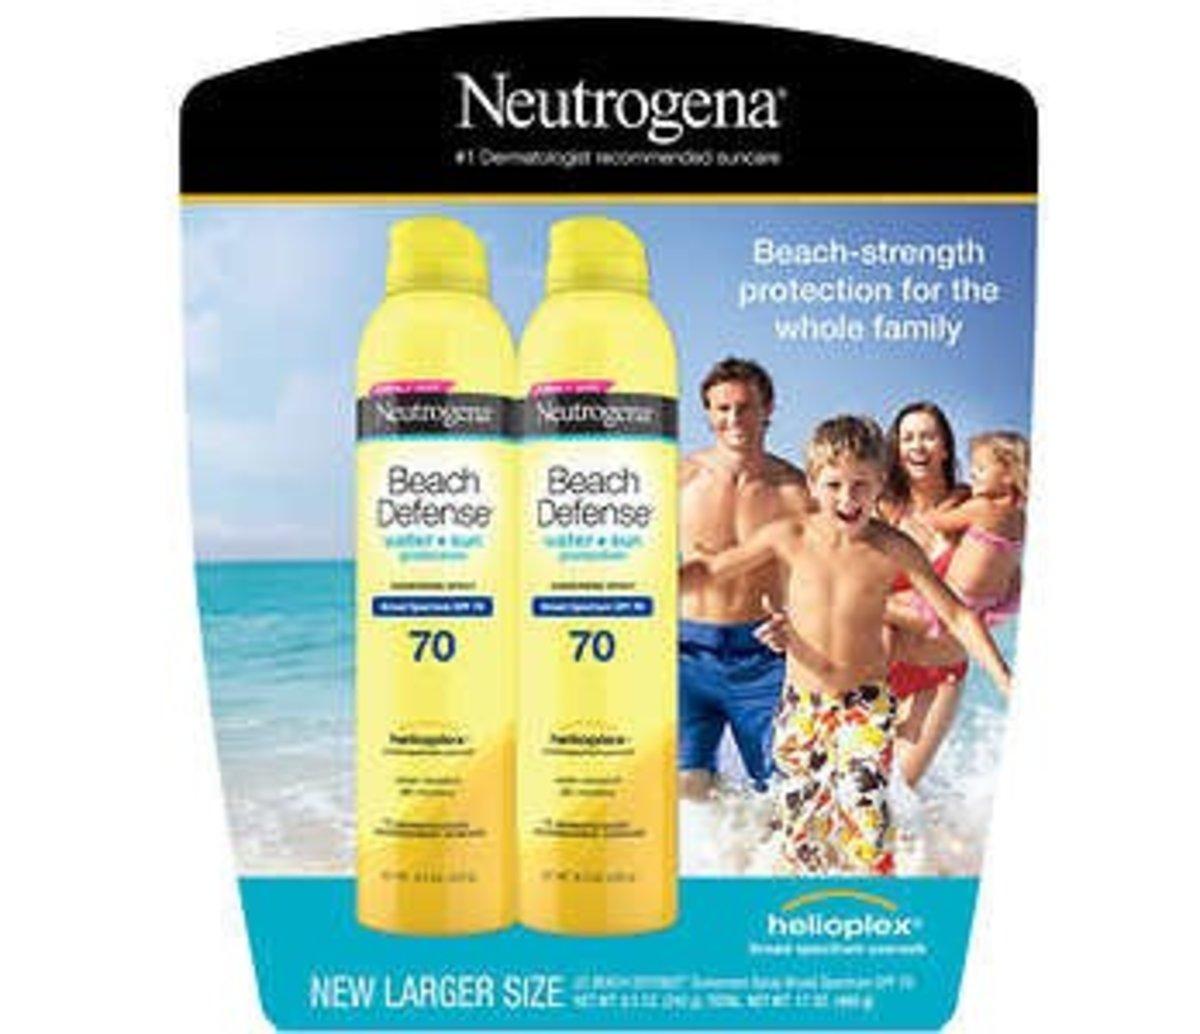 Neutrogena Beach Defense SPF 70, 2 x 251ml